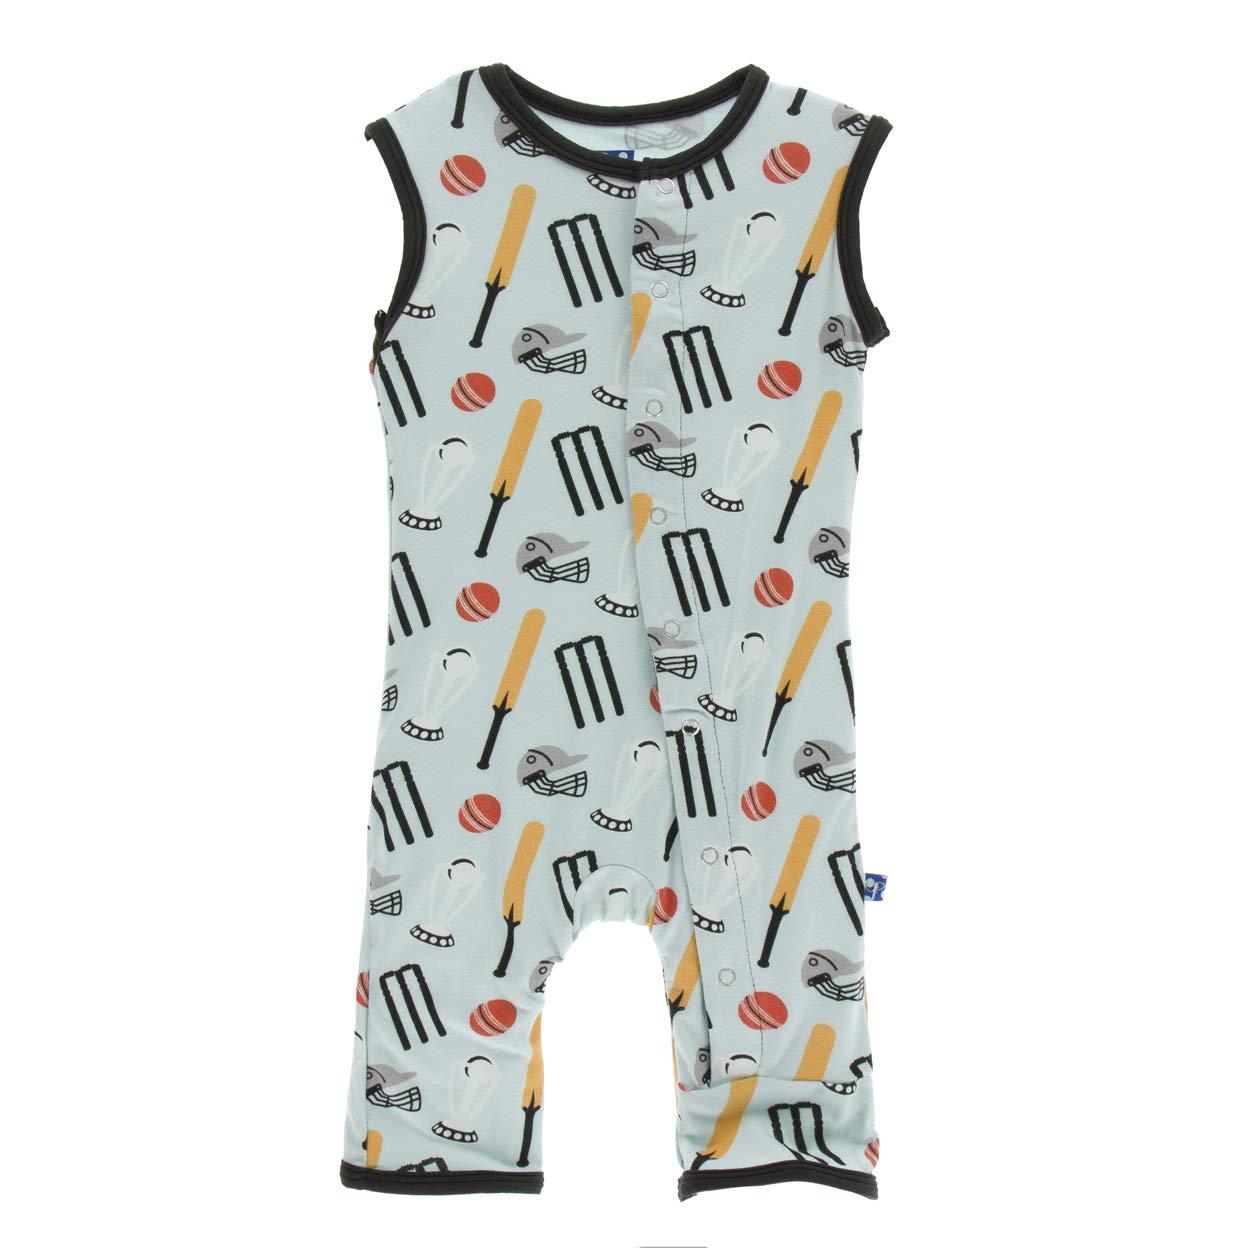 2T Spring Sky Cricket Kickee Pants Little Boys Print Tank Romper